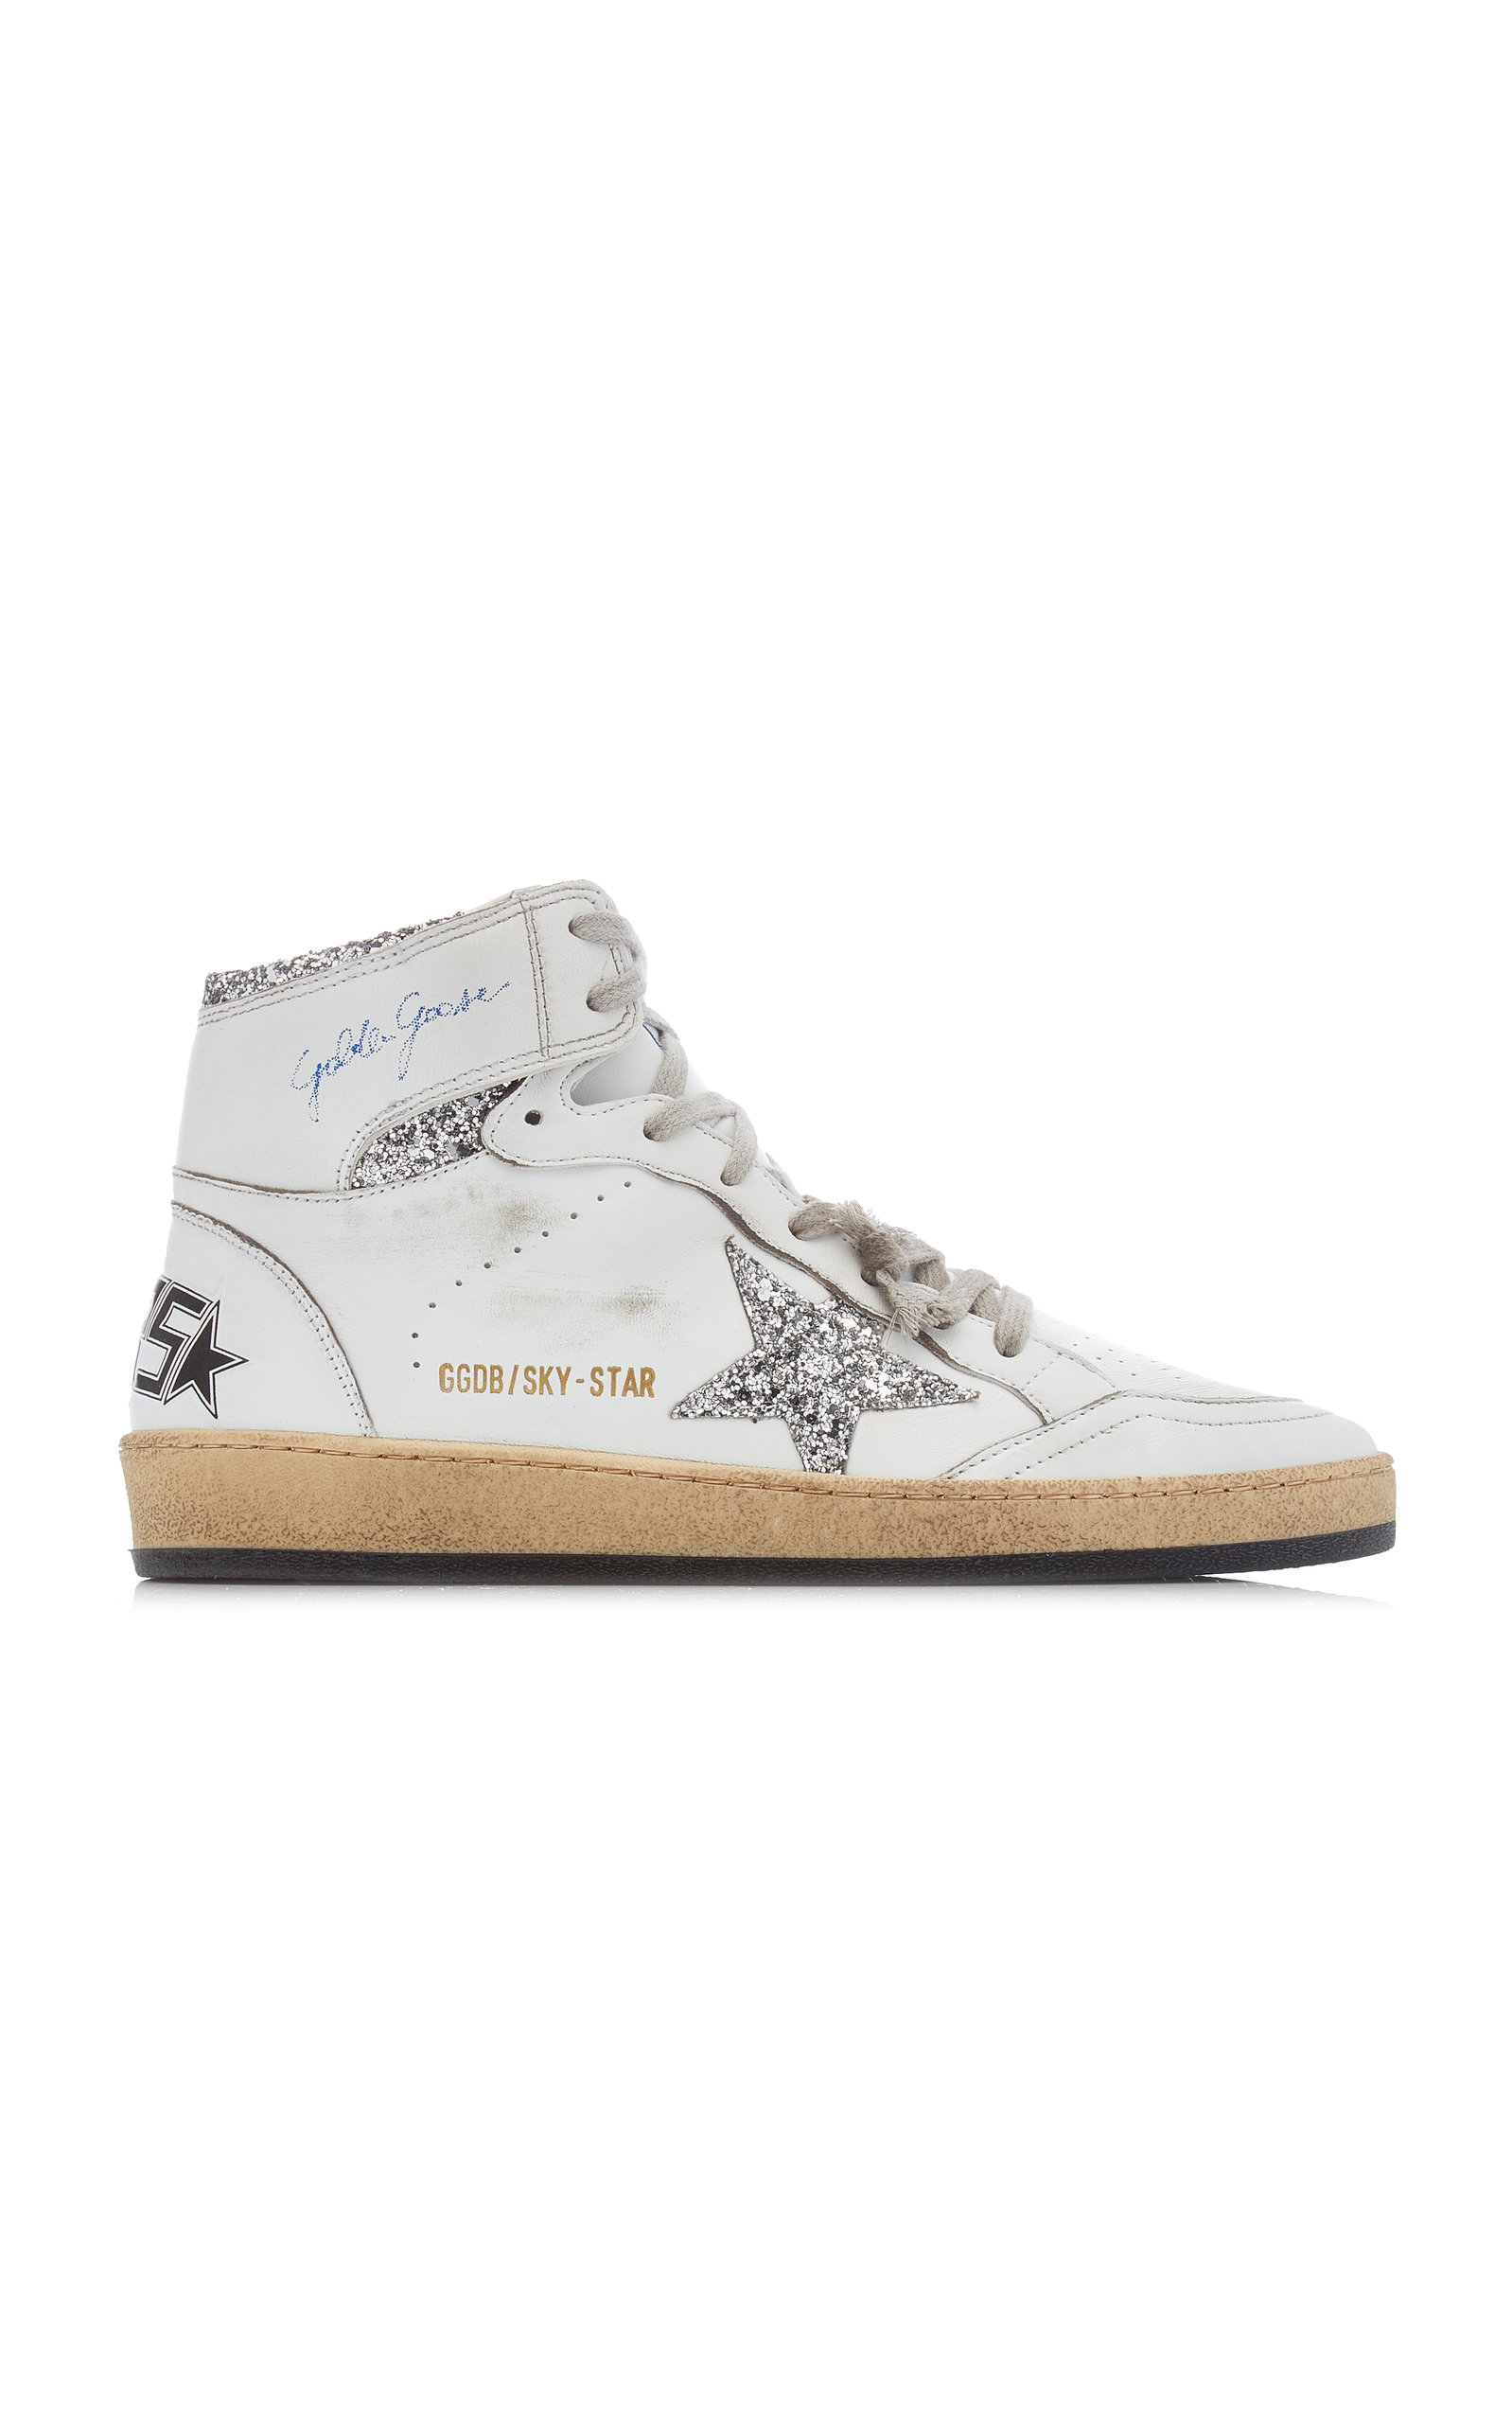 Golden Goose - Women's Sky Star Glitter-Embellished Leather Sneakers - White - Moda Operandi